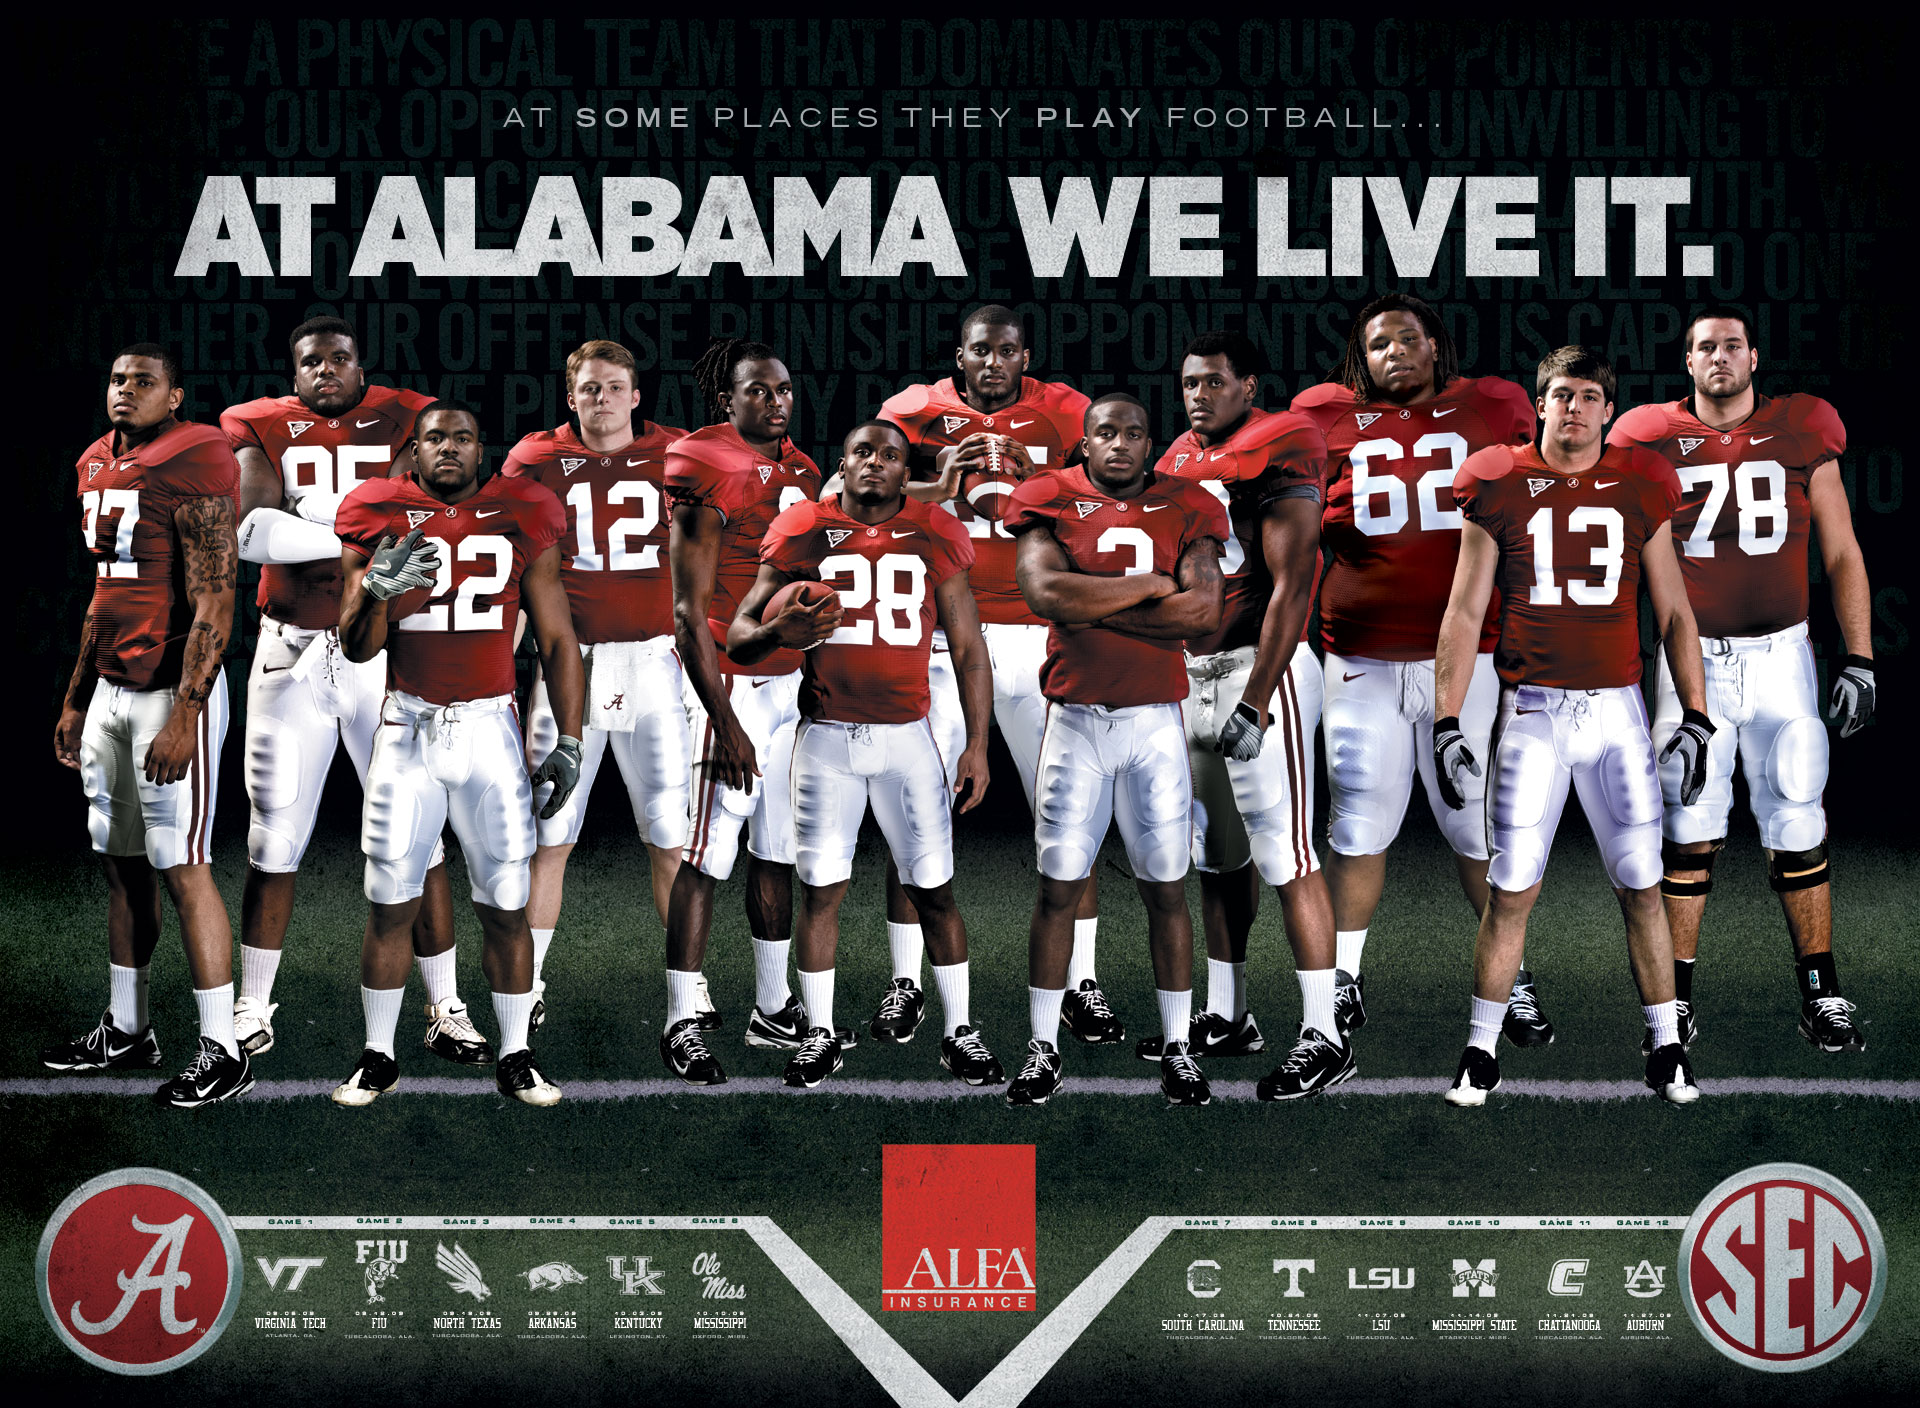 Alabama Football HD Wallpapers Hd Wallpapers 1920x1408